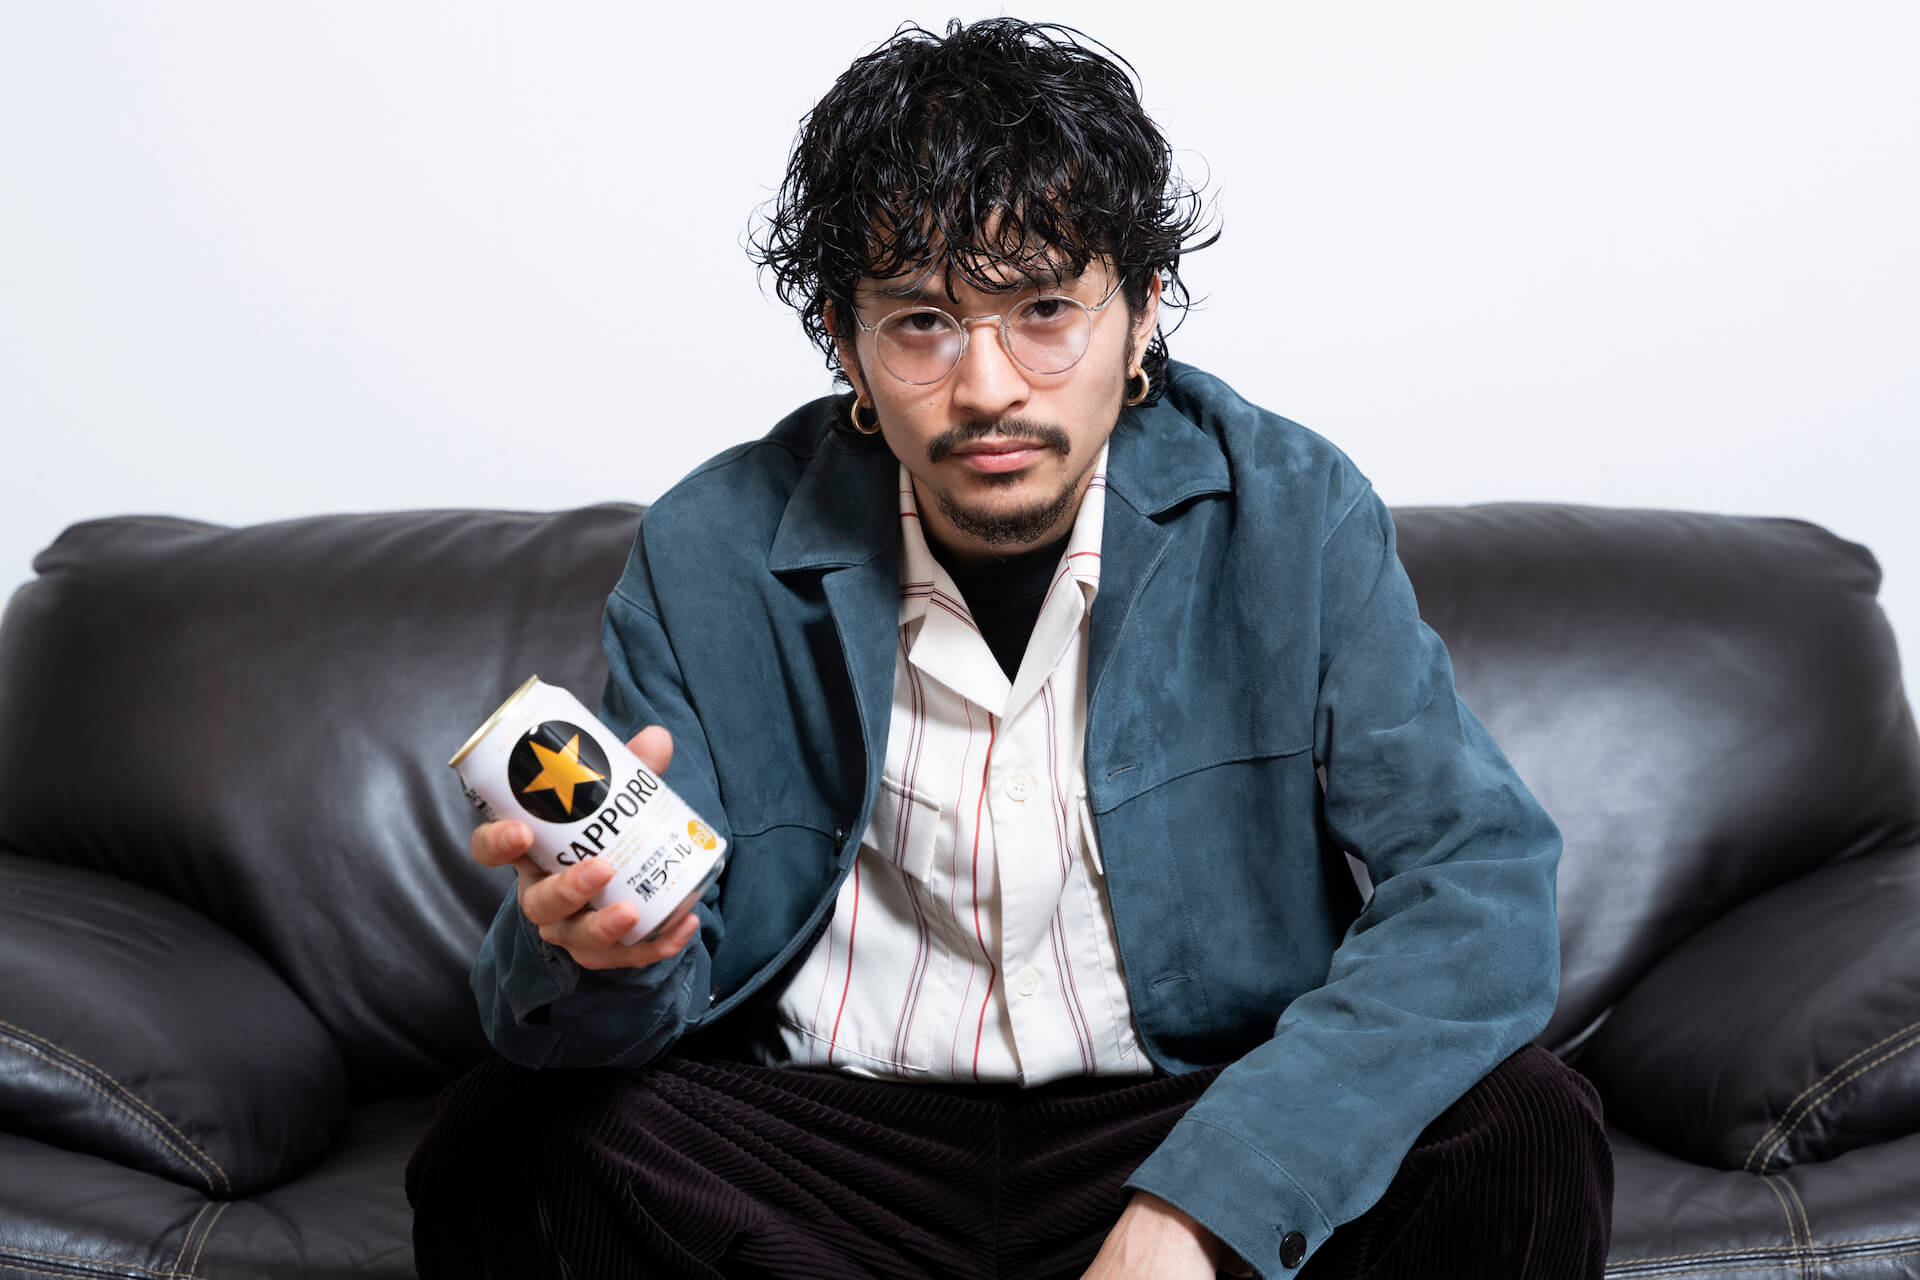 King Gnu常田大希が音楽について語るサッポロビールのCM新バージョンが放映決定!ホームページで特別メッセージムービーも公開 art200707_tsunetadaiki_beer_11